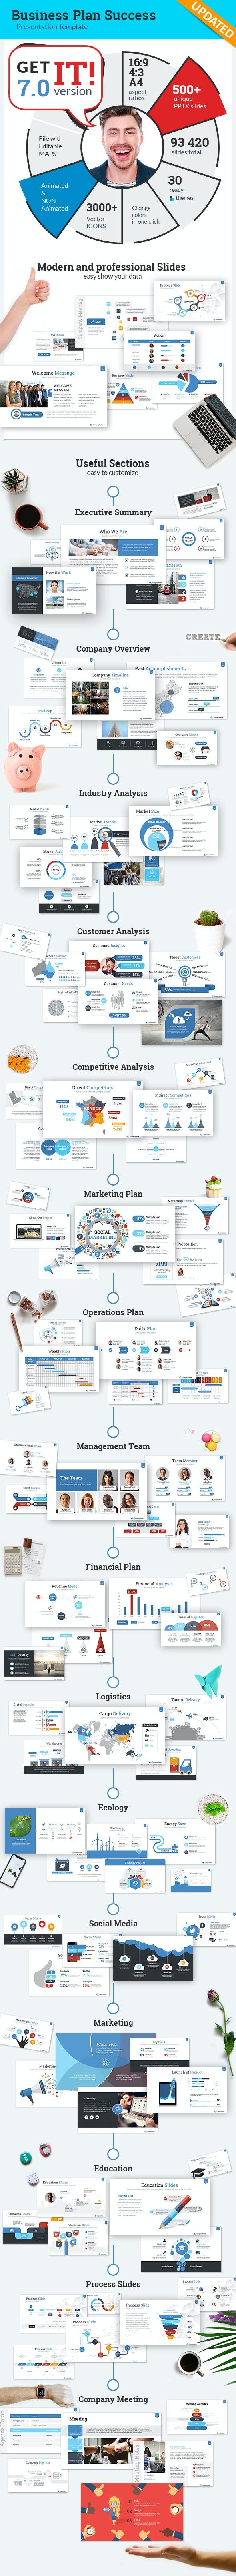 Business Plan Success PowerPoint Presentation Template - Business PowerPoint Templates